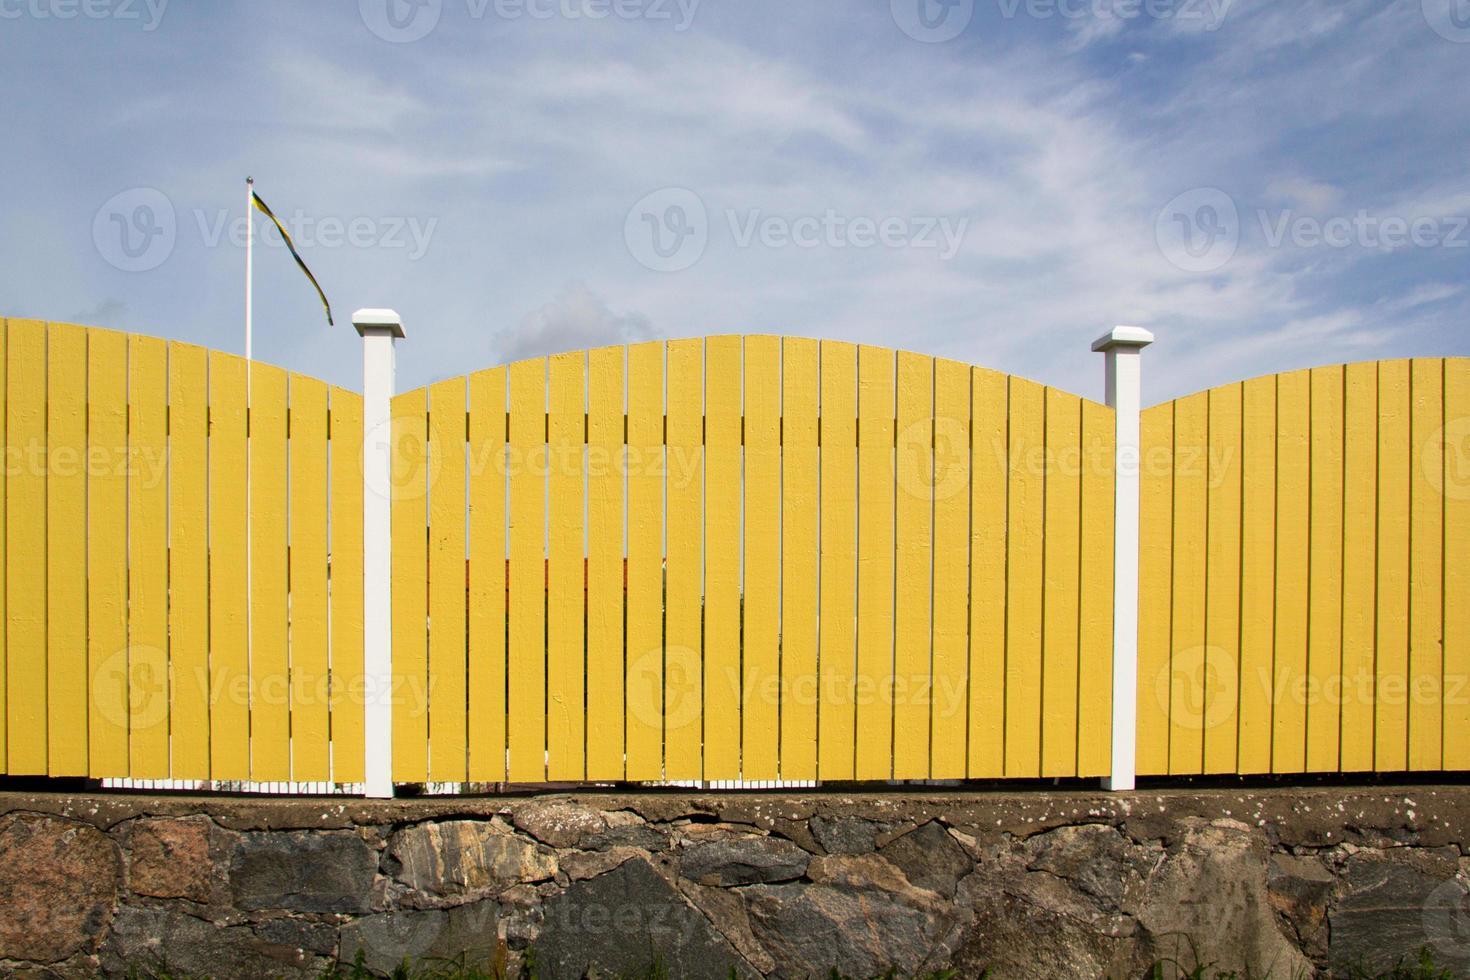 Zweedse planken hek foto